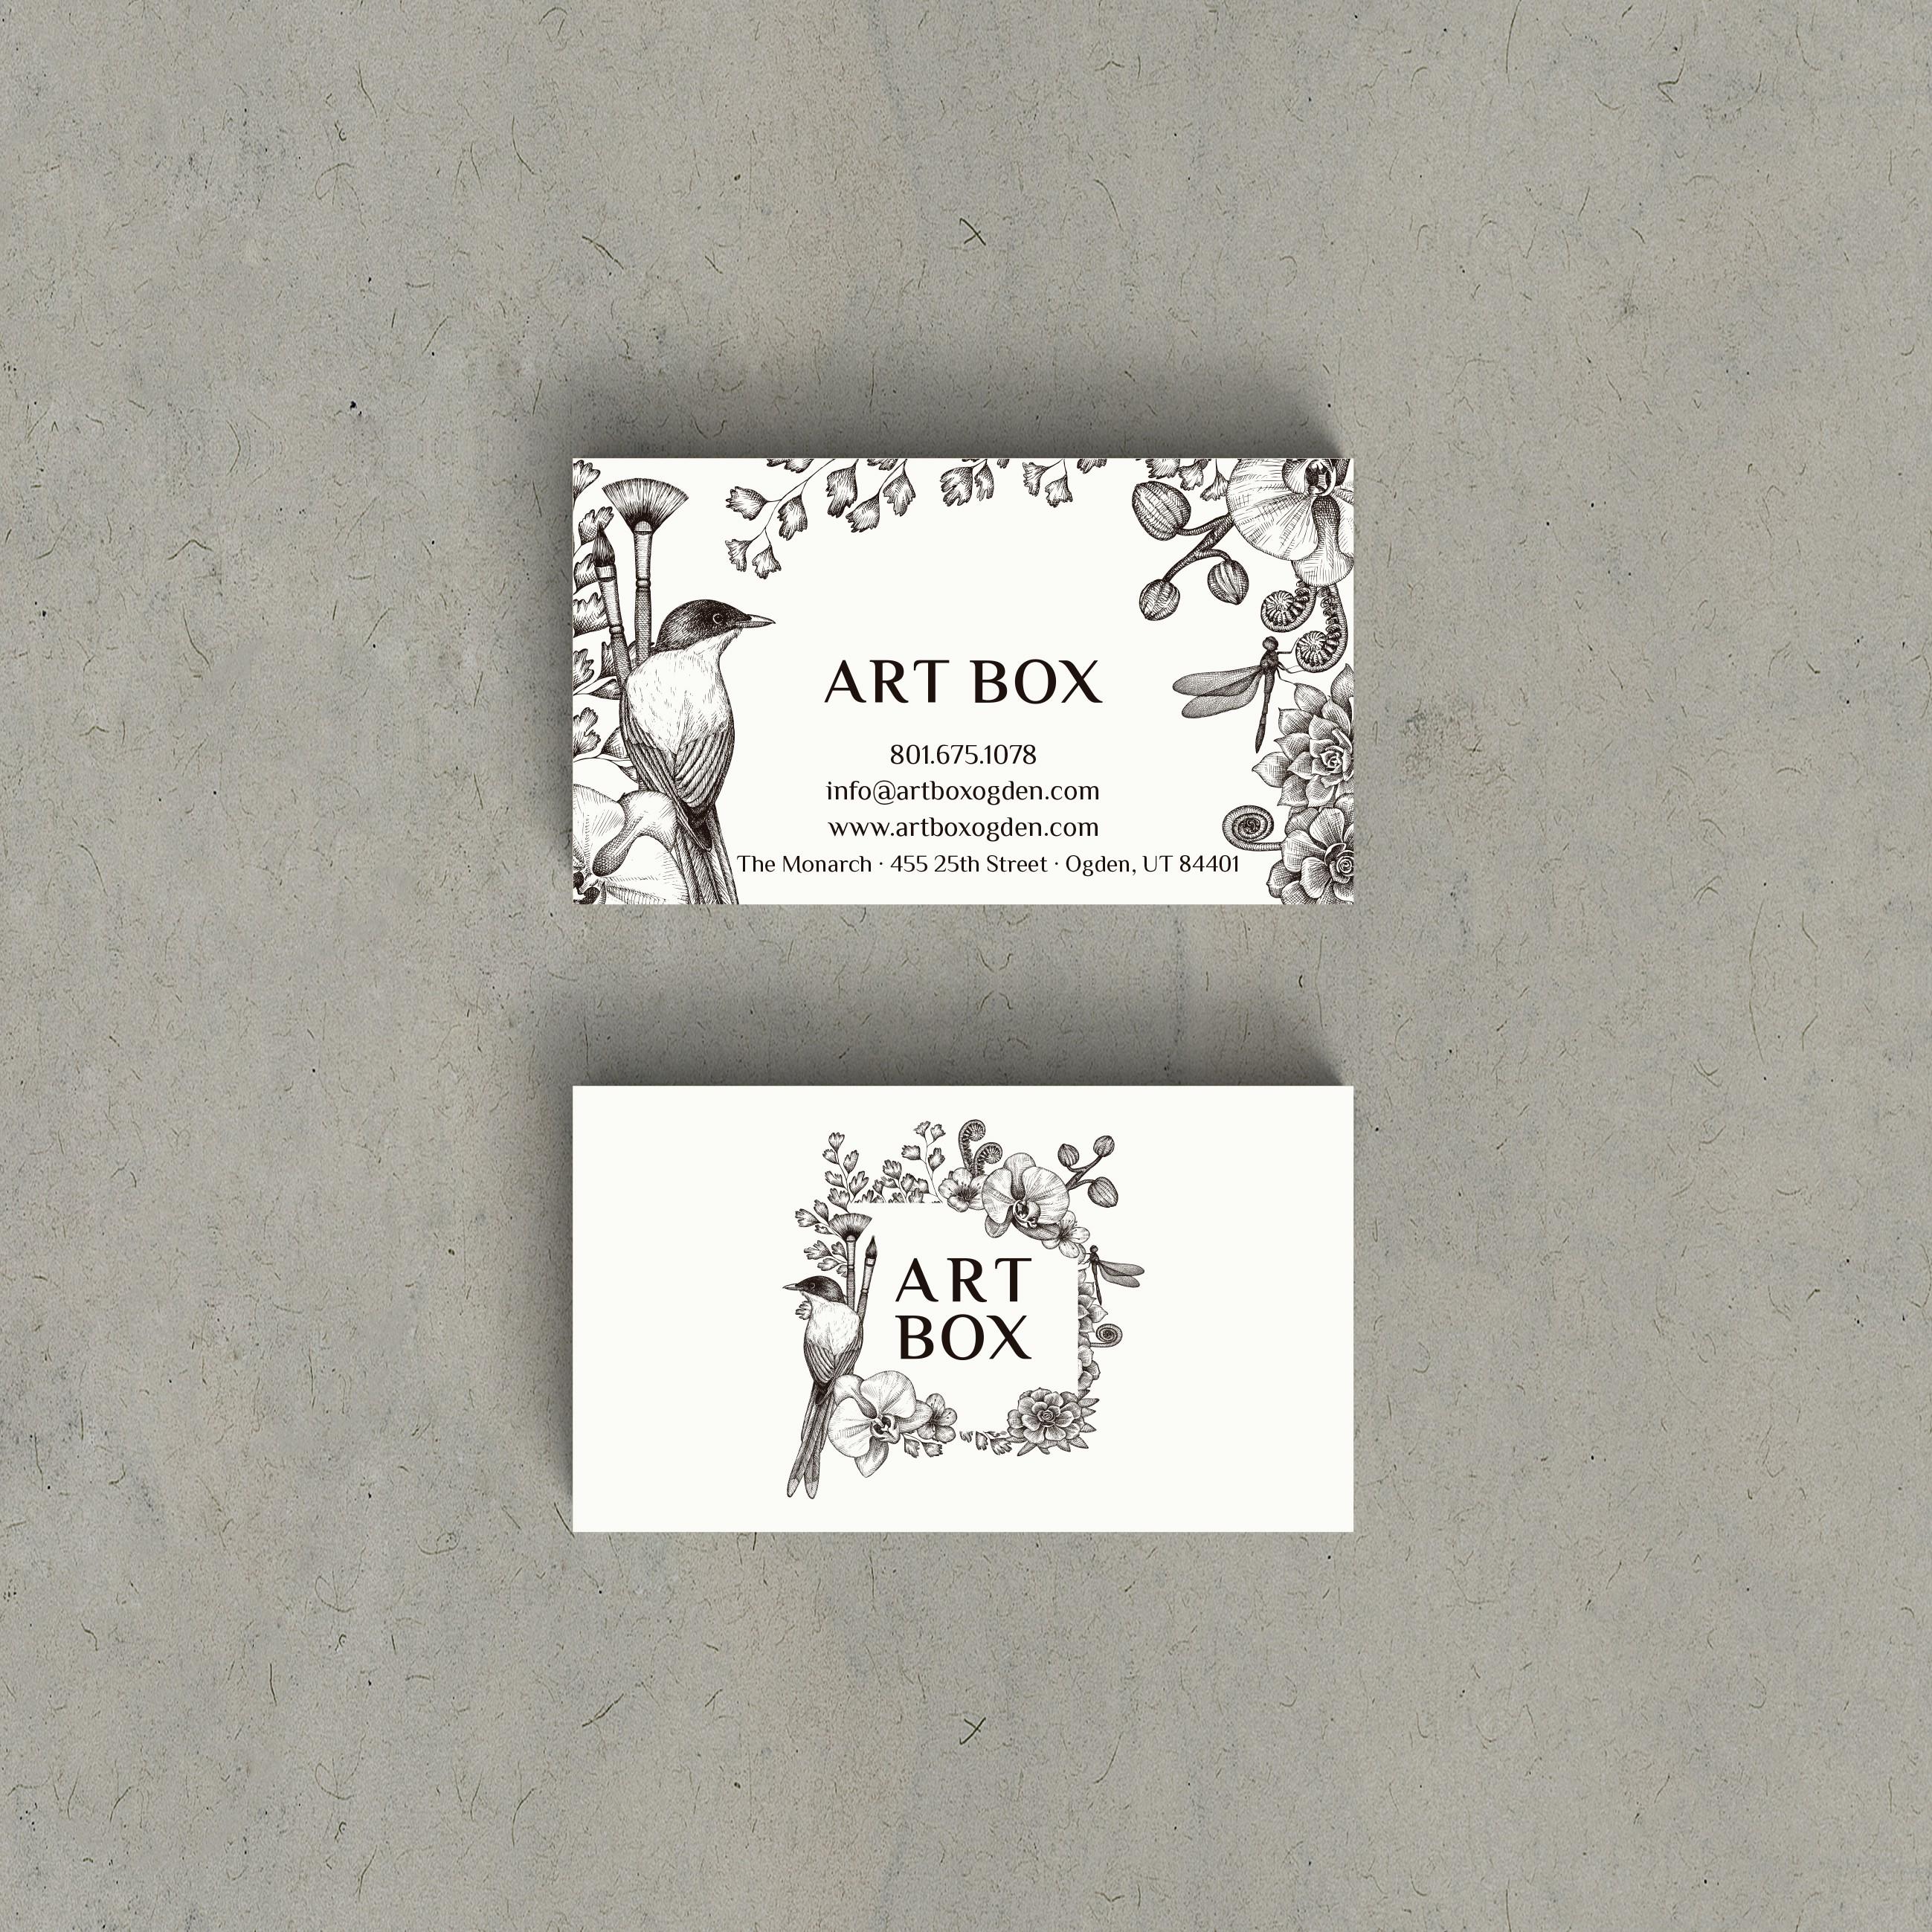 Art Box Shop Card Revision